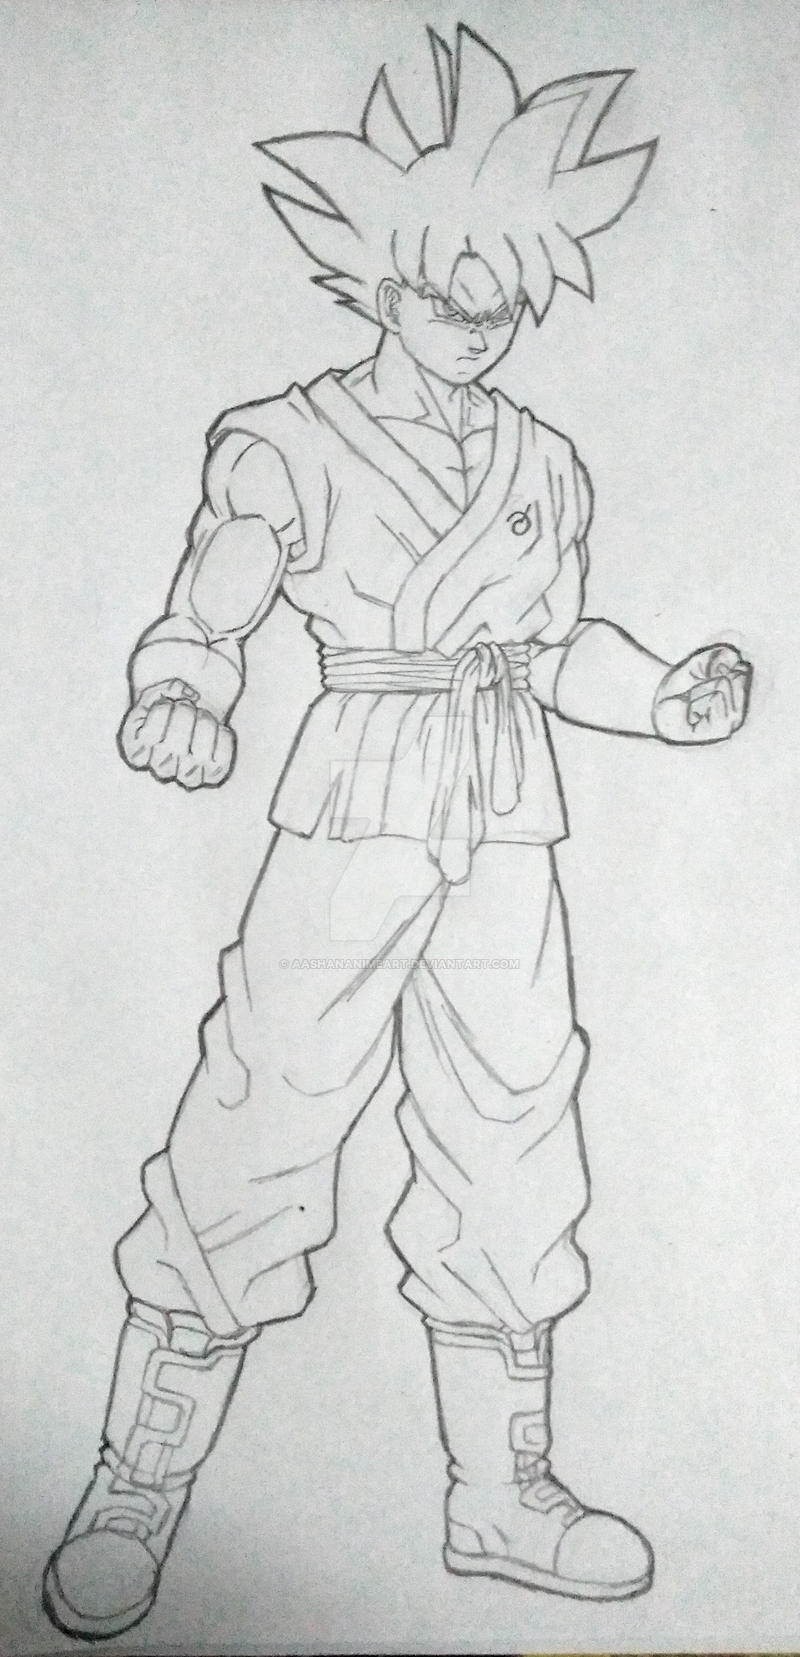 Goku ultra instinct sketch by aashananimeart on deviantart - Goku ultra instinct sketch ...